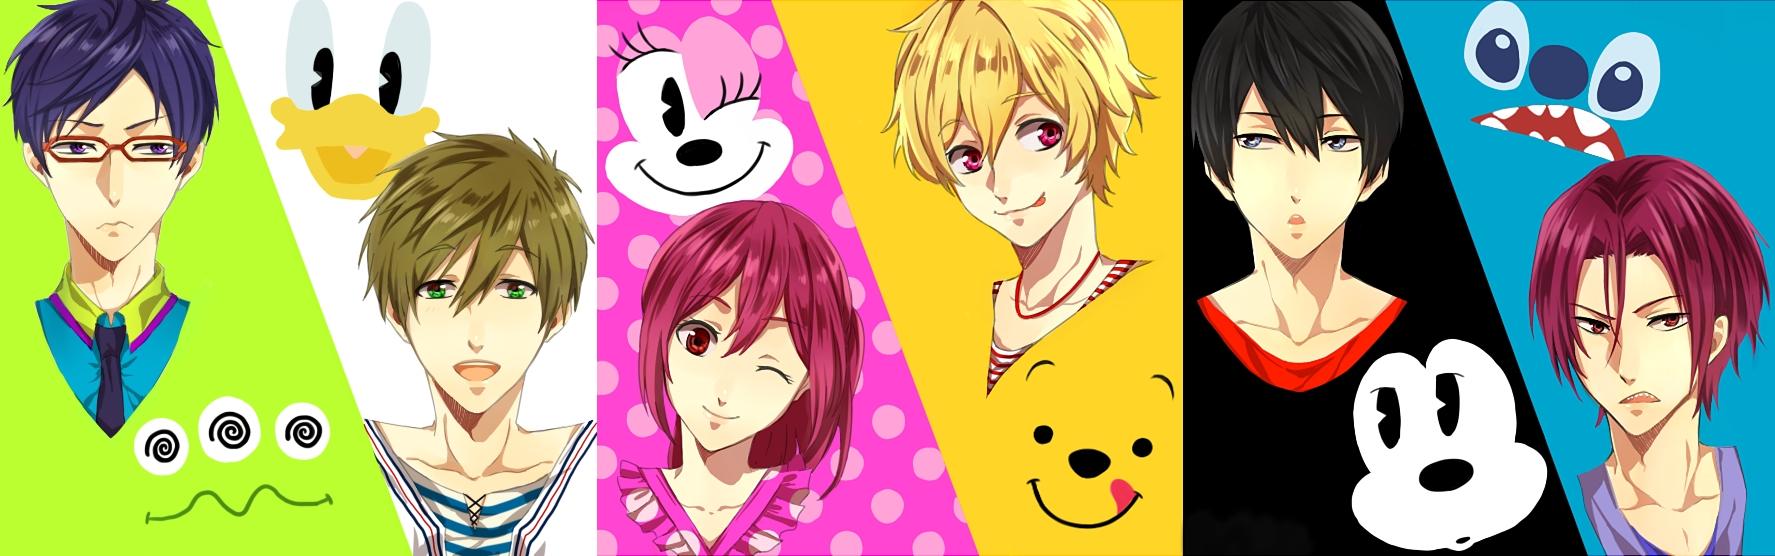 Stitch Character Lilo Stitch Zerochan Anime Image Board